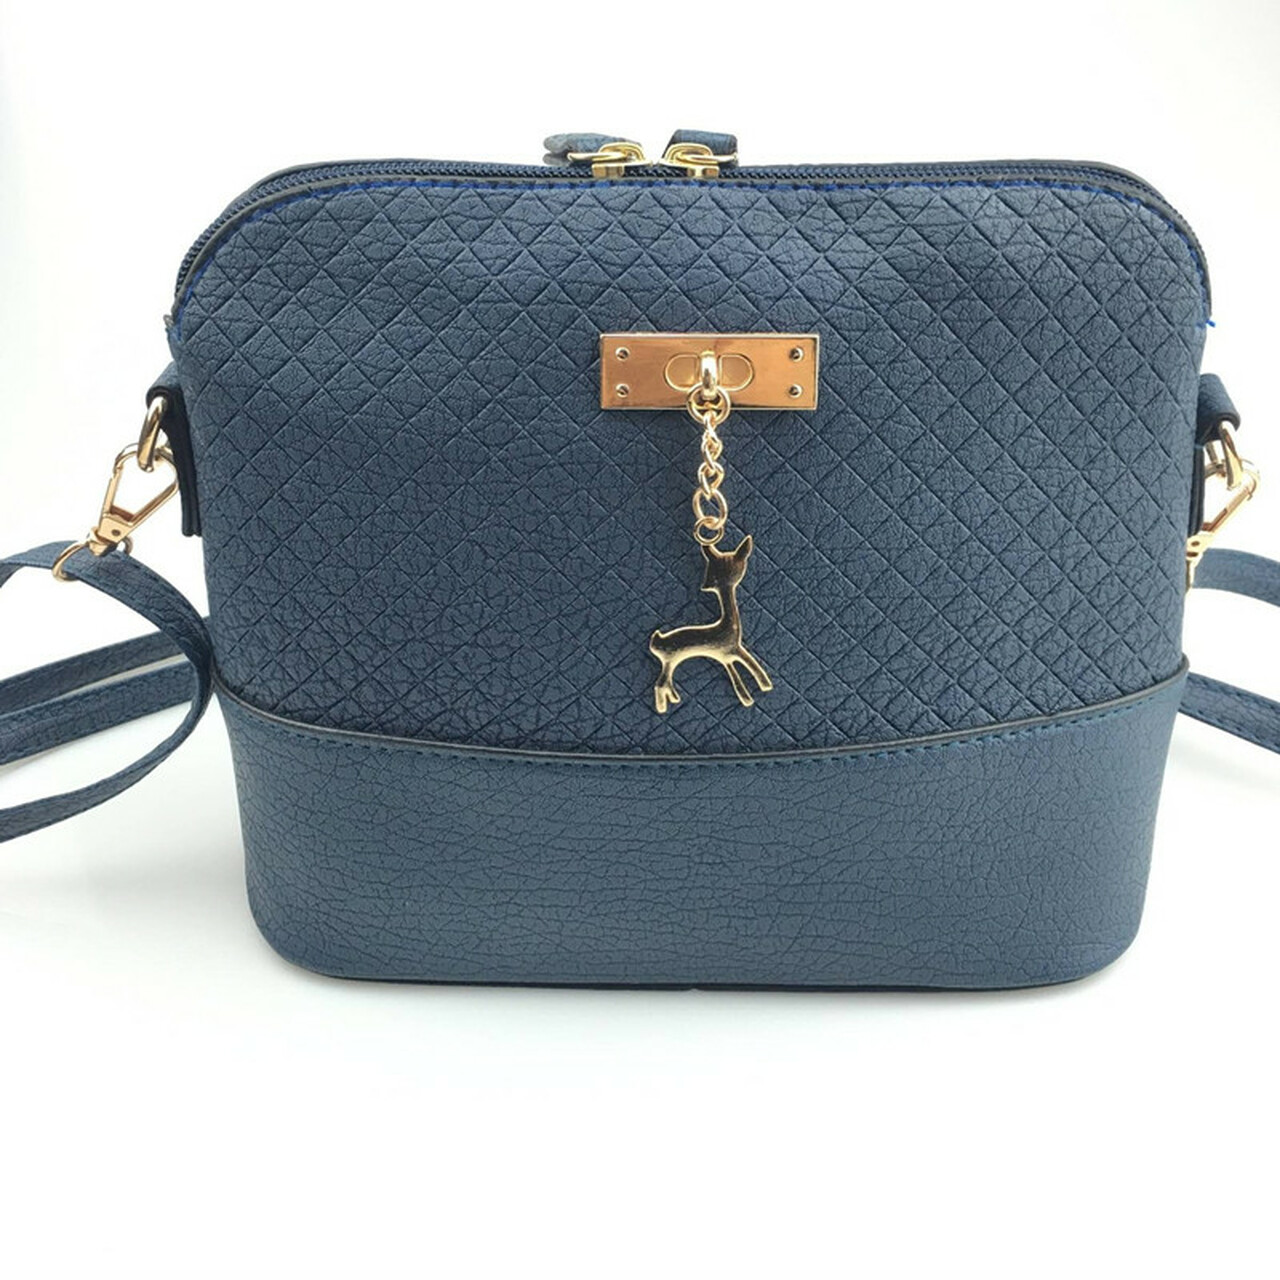 d27c41d7e46ec ... Luxury Handbags Women Bags Leather Designer 2018 Women Crossbody  Shoulder Messenger Bags Shell Shape Lady Mini ...